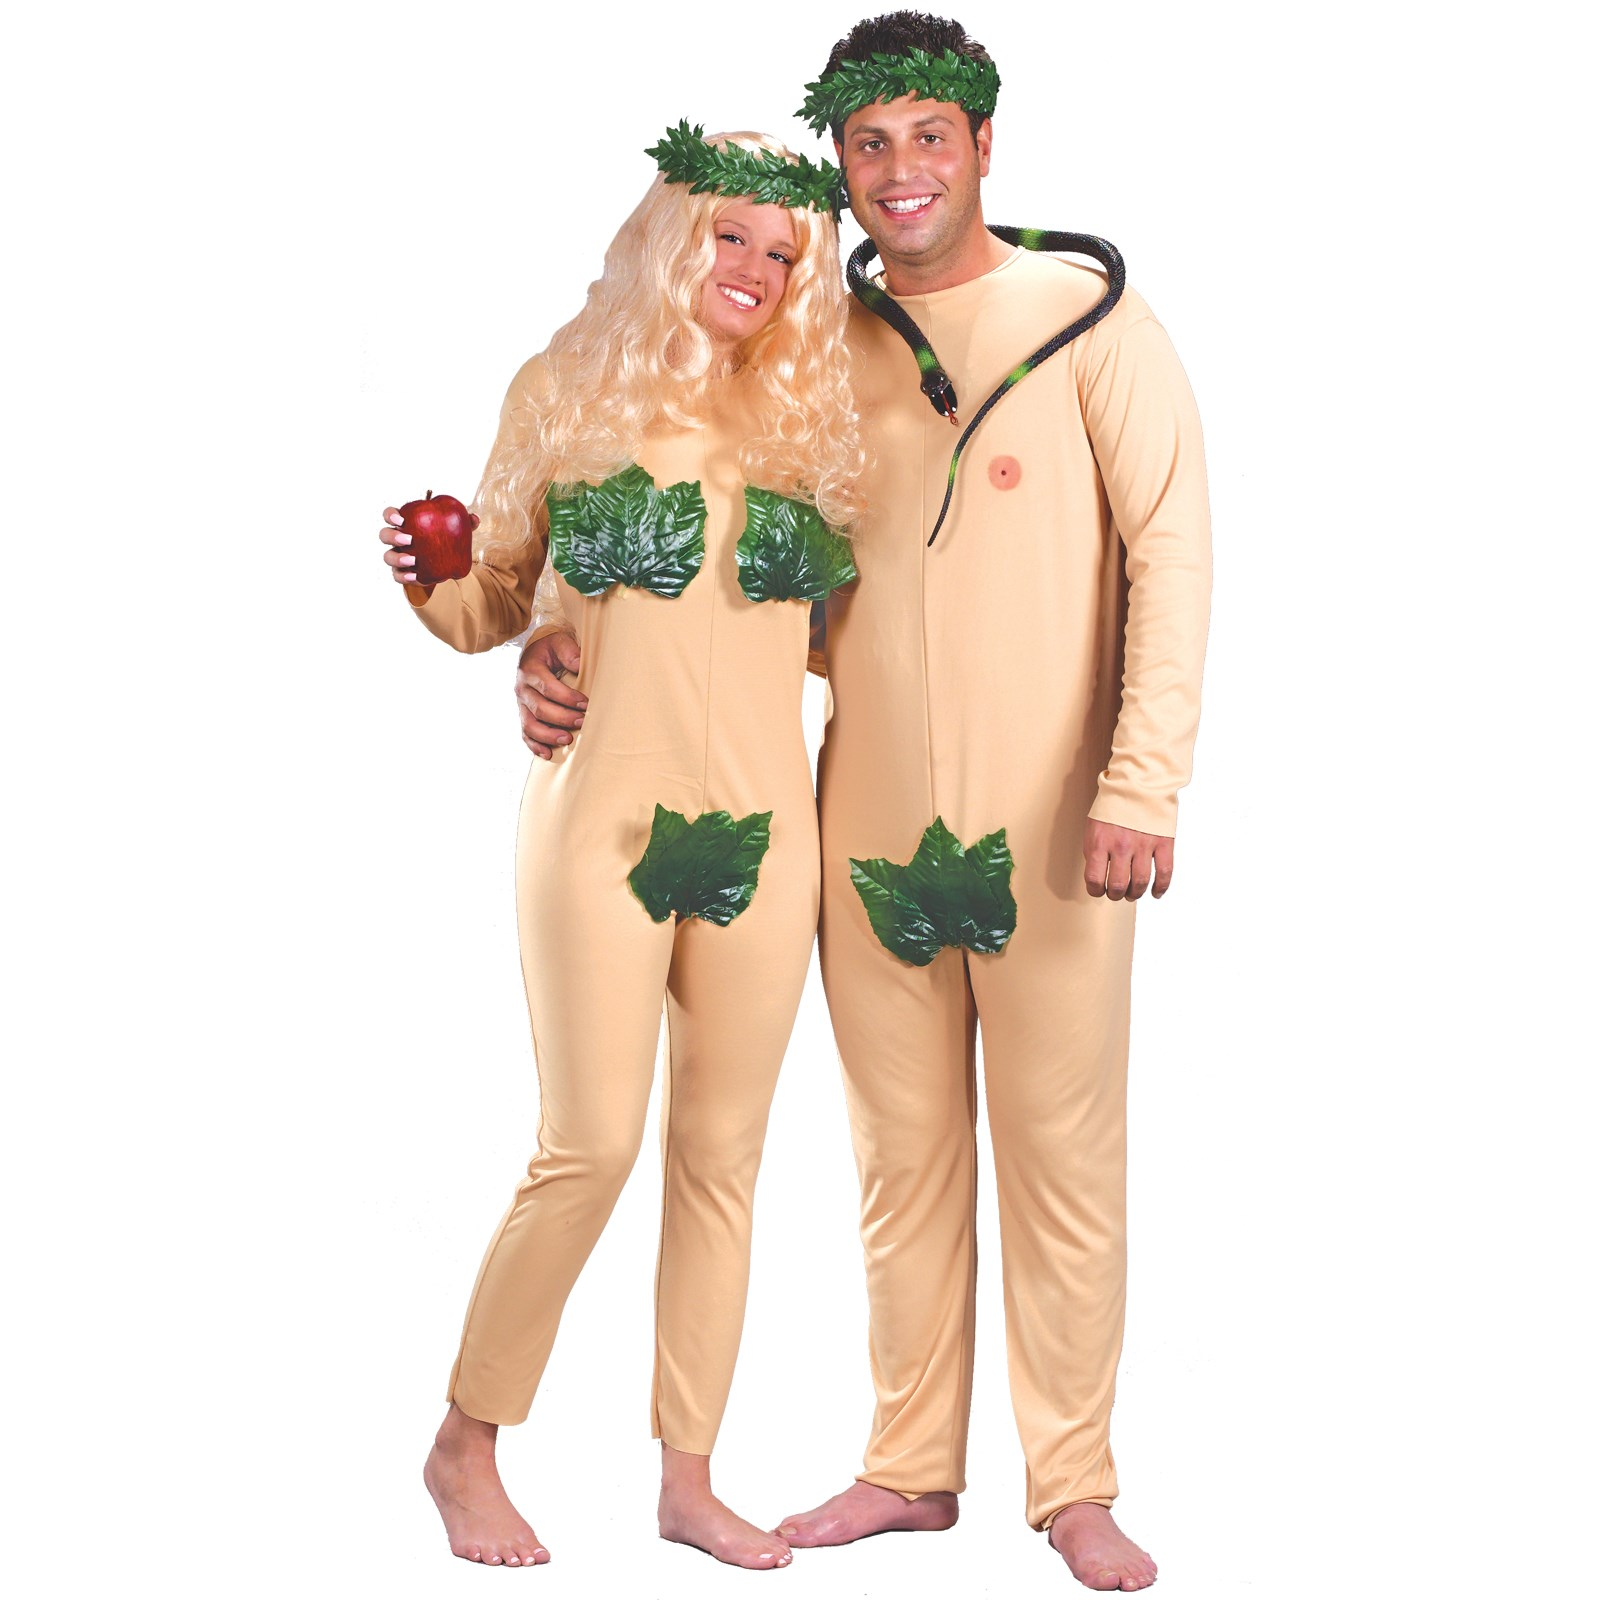 Couples Halloween Costumes | BuyCostumes.com